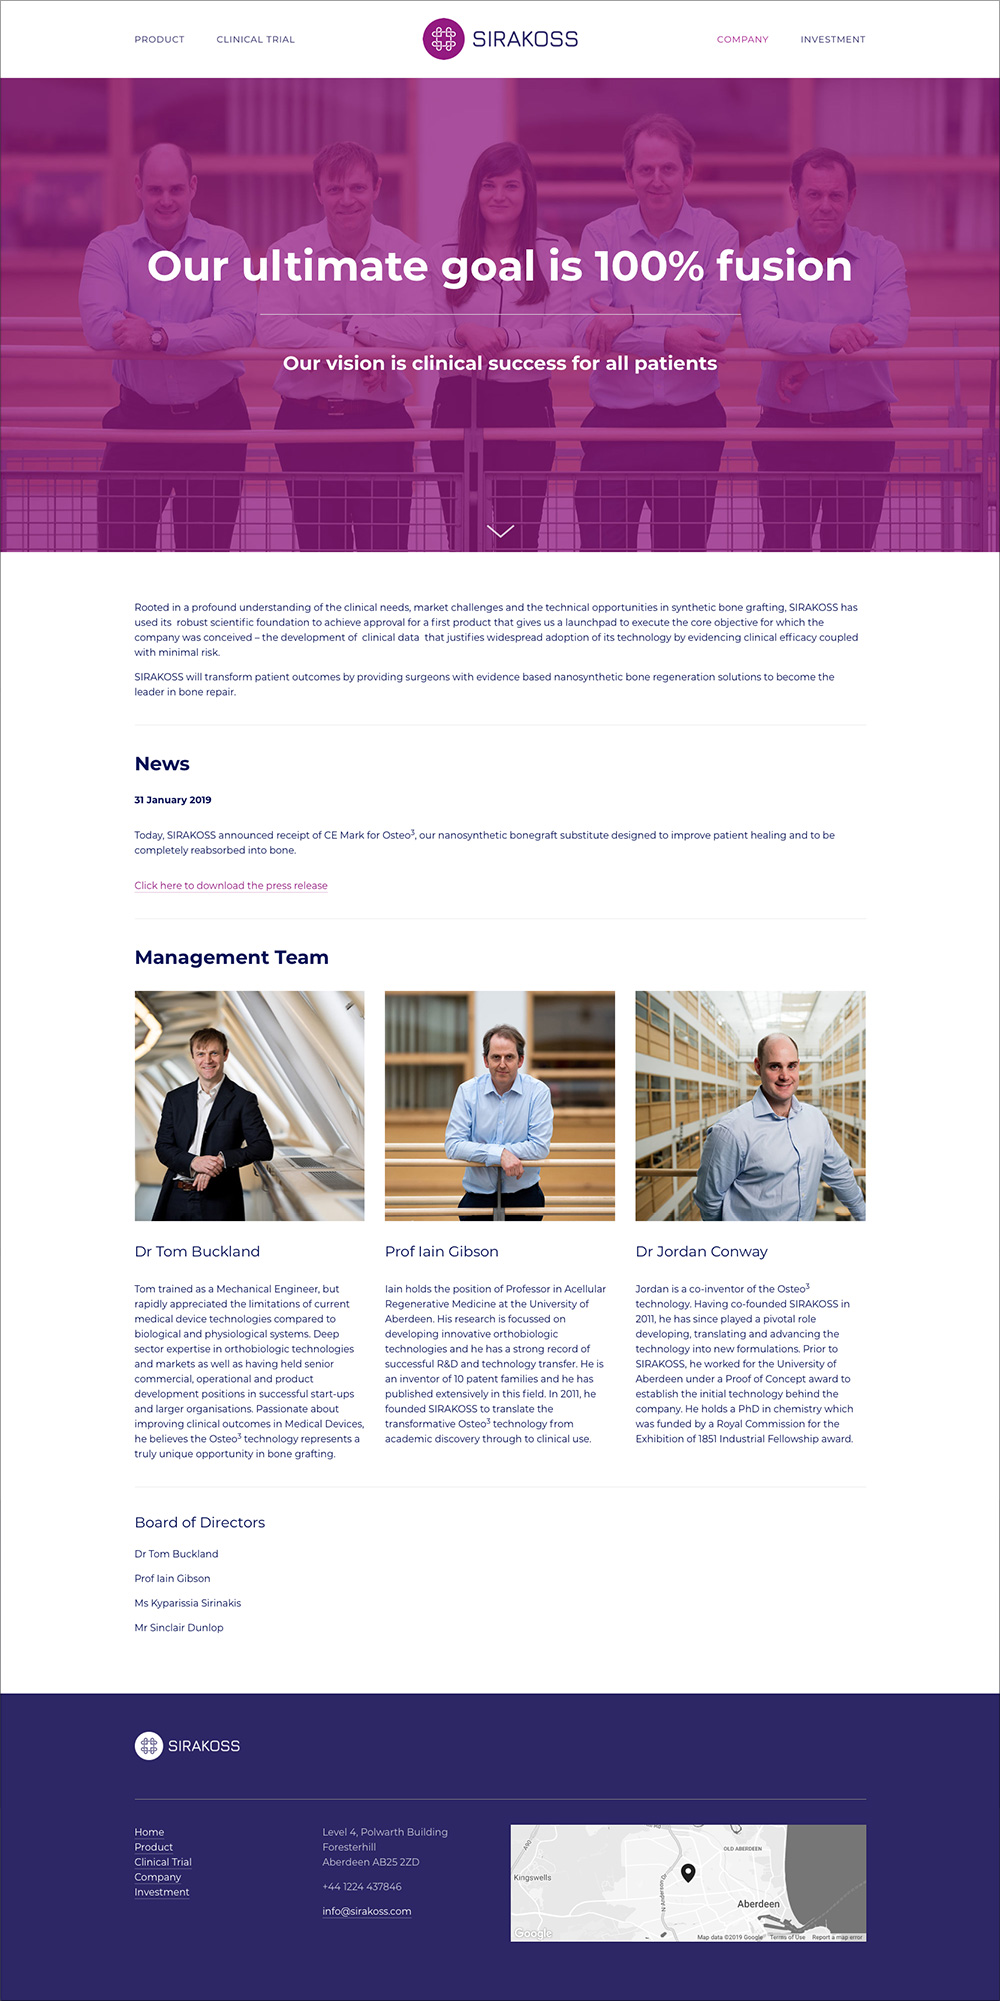 sirakoss-website-company.jpg